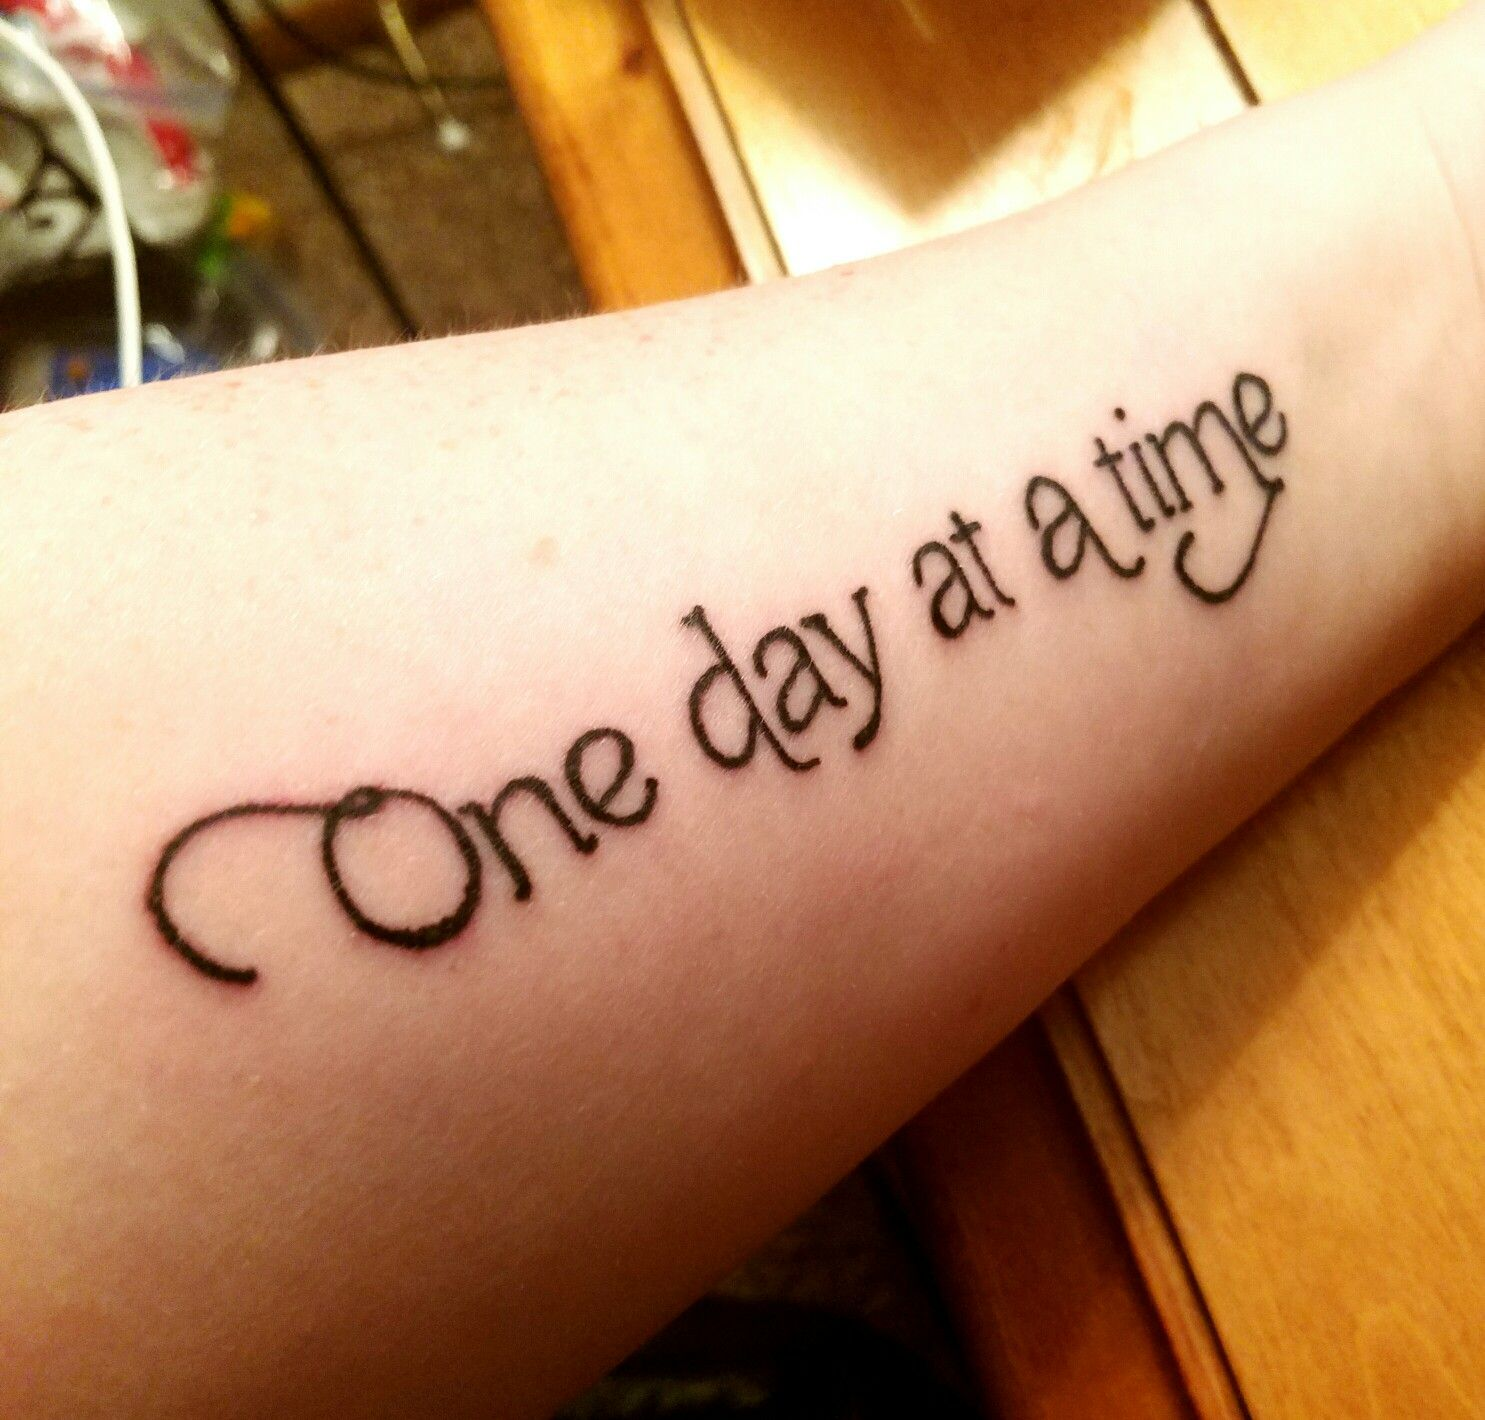 One Day At A Time Tattoo Suicidesurvivor Onedayatatime Tattoo